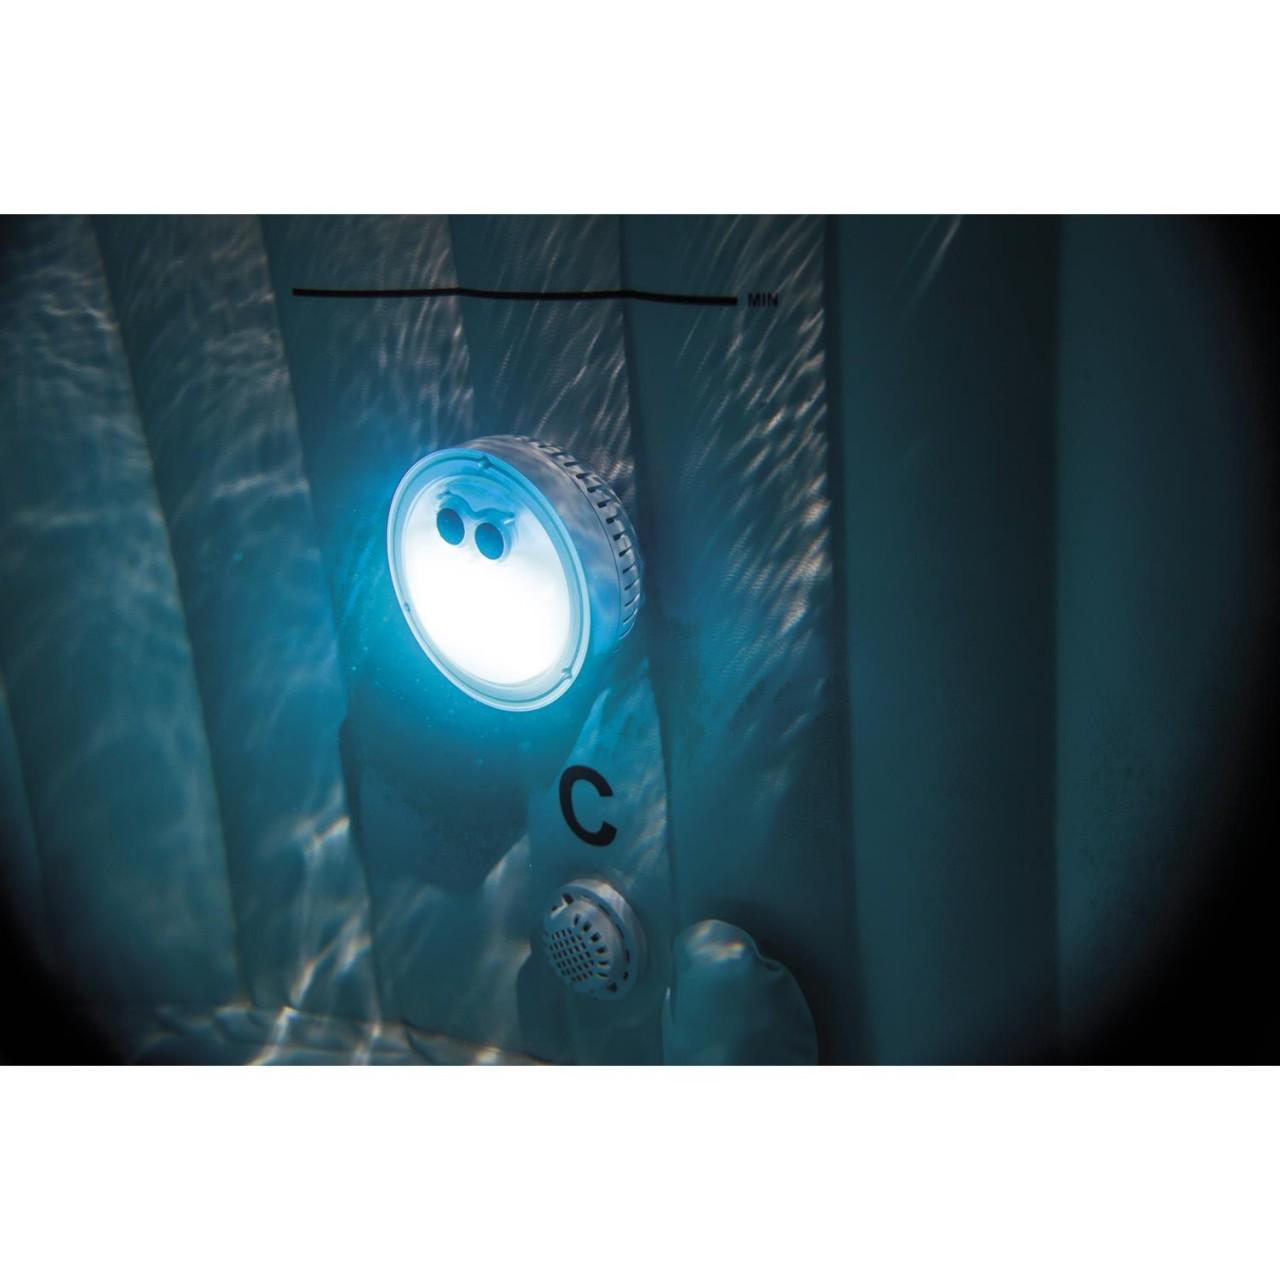 Intex 28503 LED Licht Beleuchtung 5 Farben Whirlpool PureSpa Bubble Jacuzzi